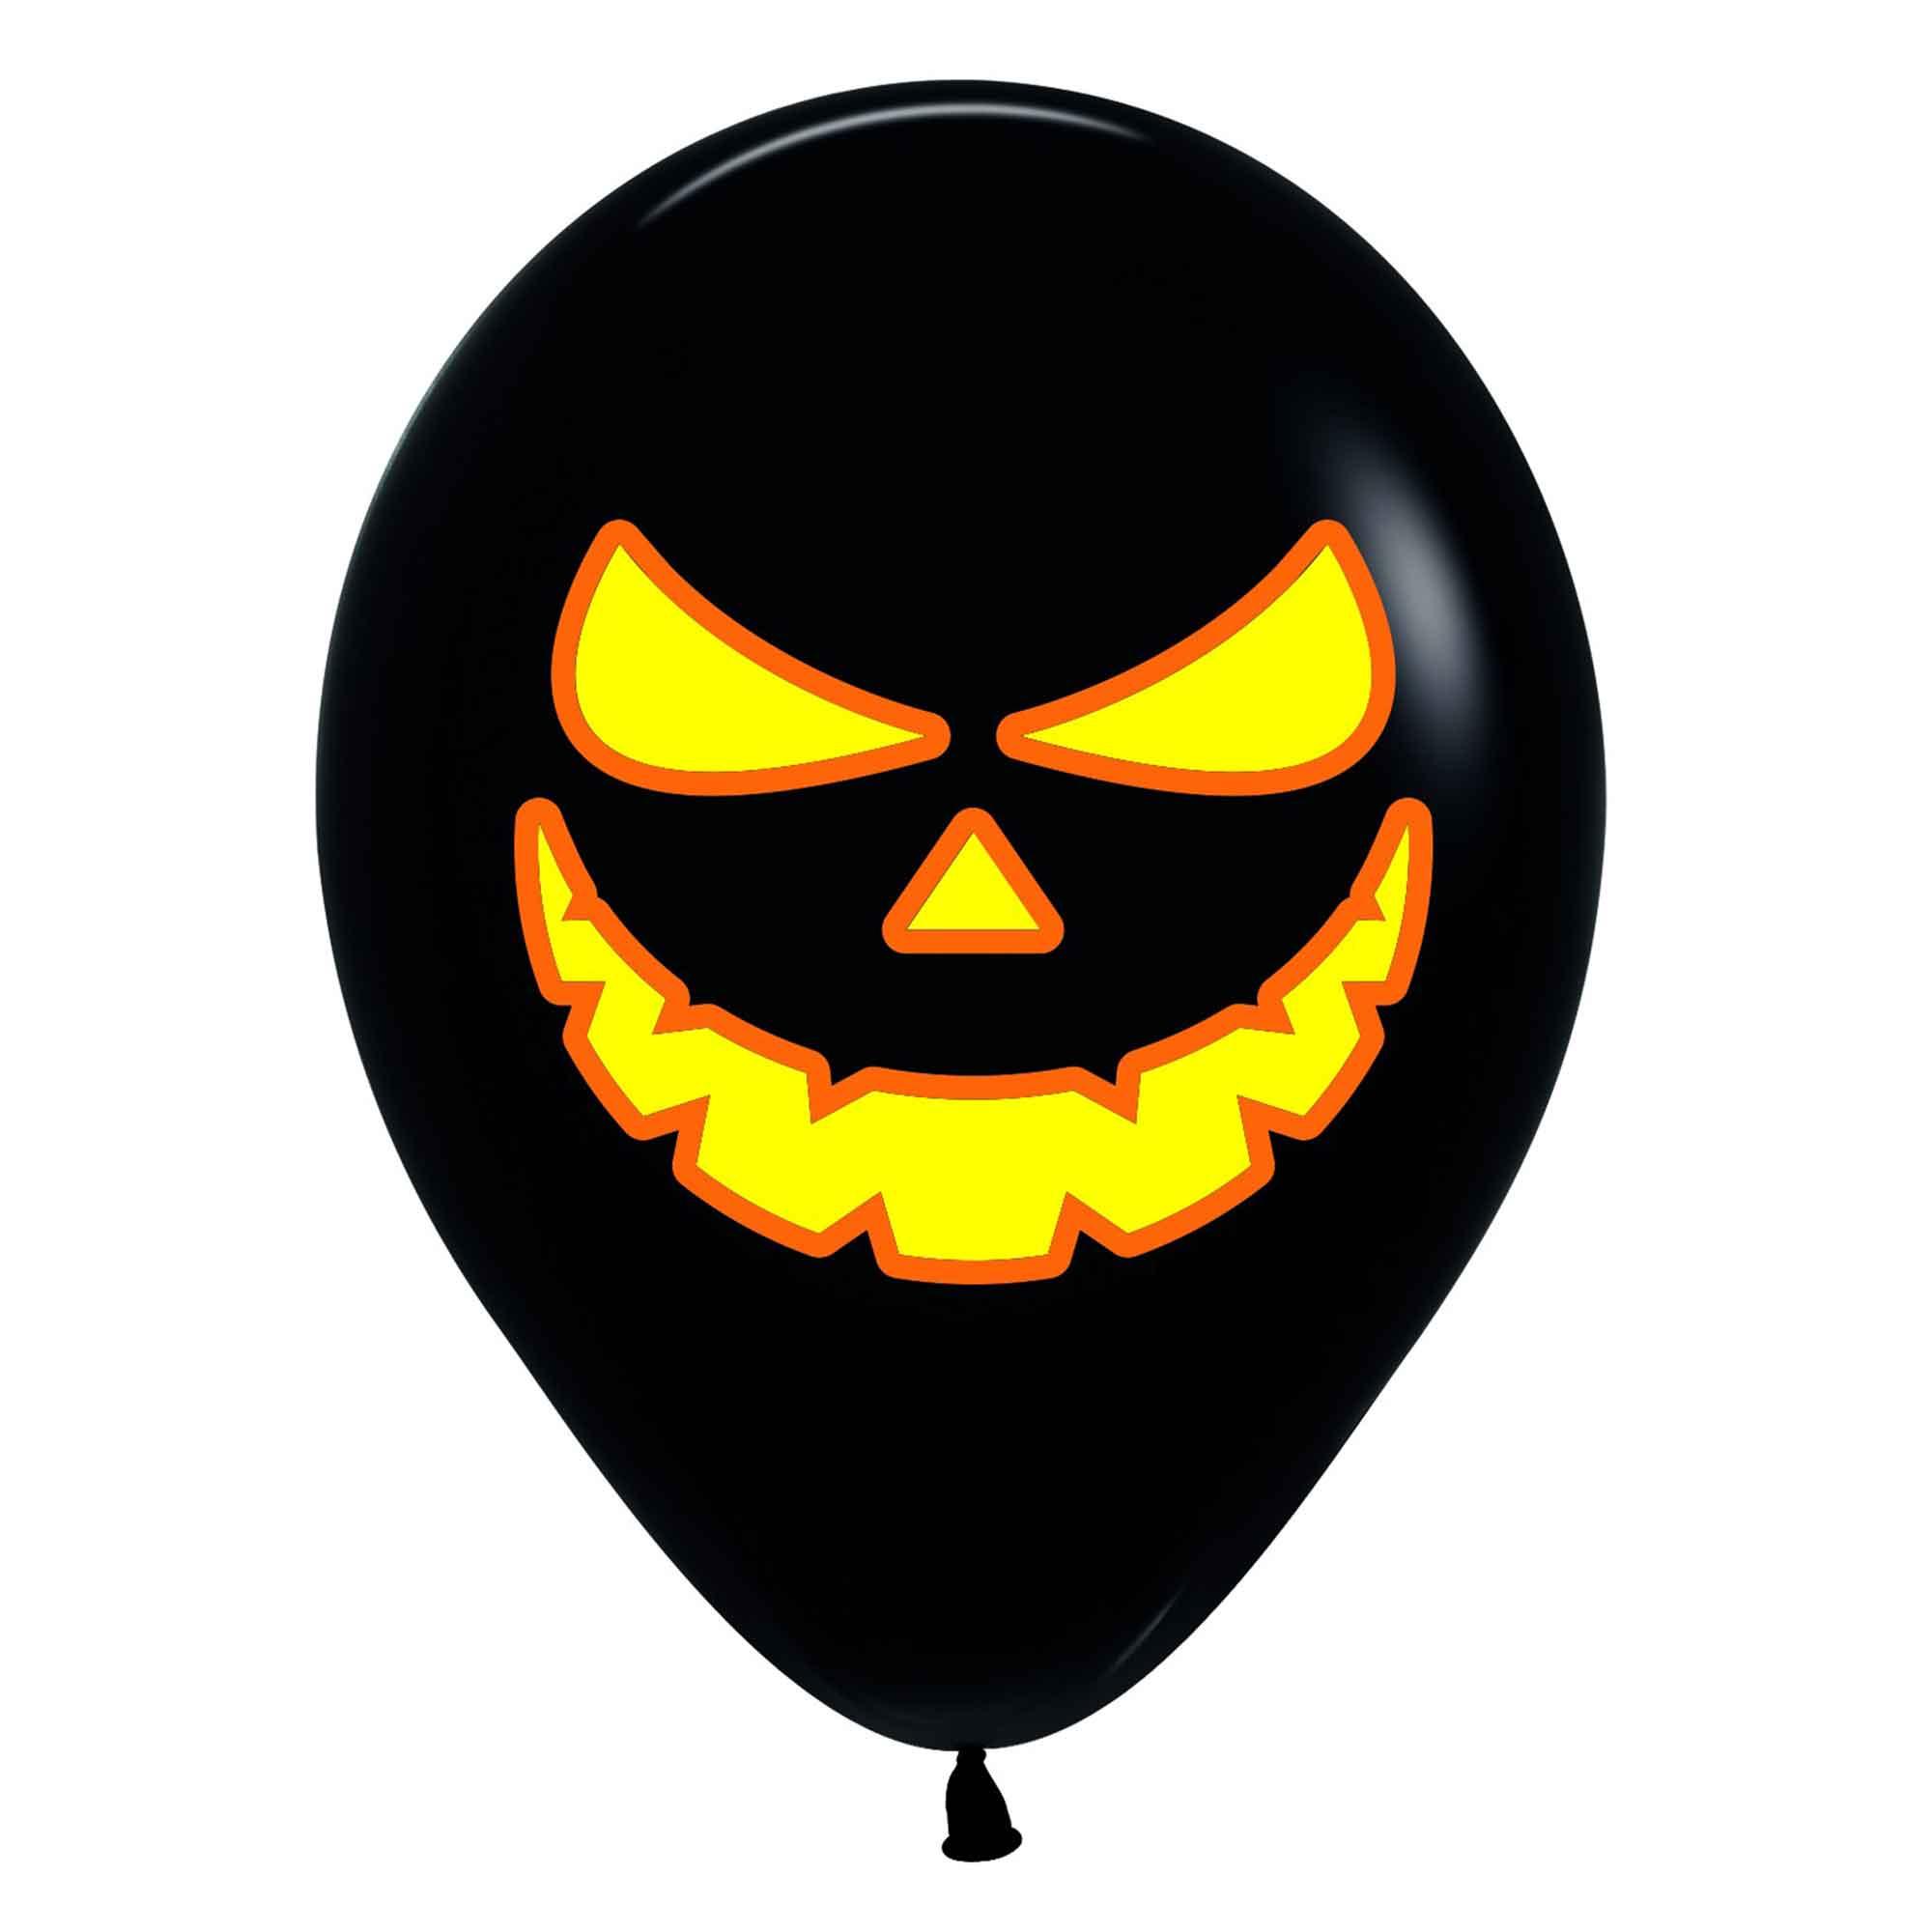 Sempertex 30cm Bright Pumpkin Scary Faces Fashion Black & Neon & Orange Ink Latex Balloons, 12PK